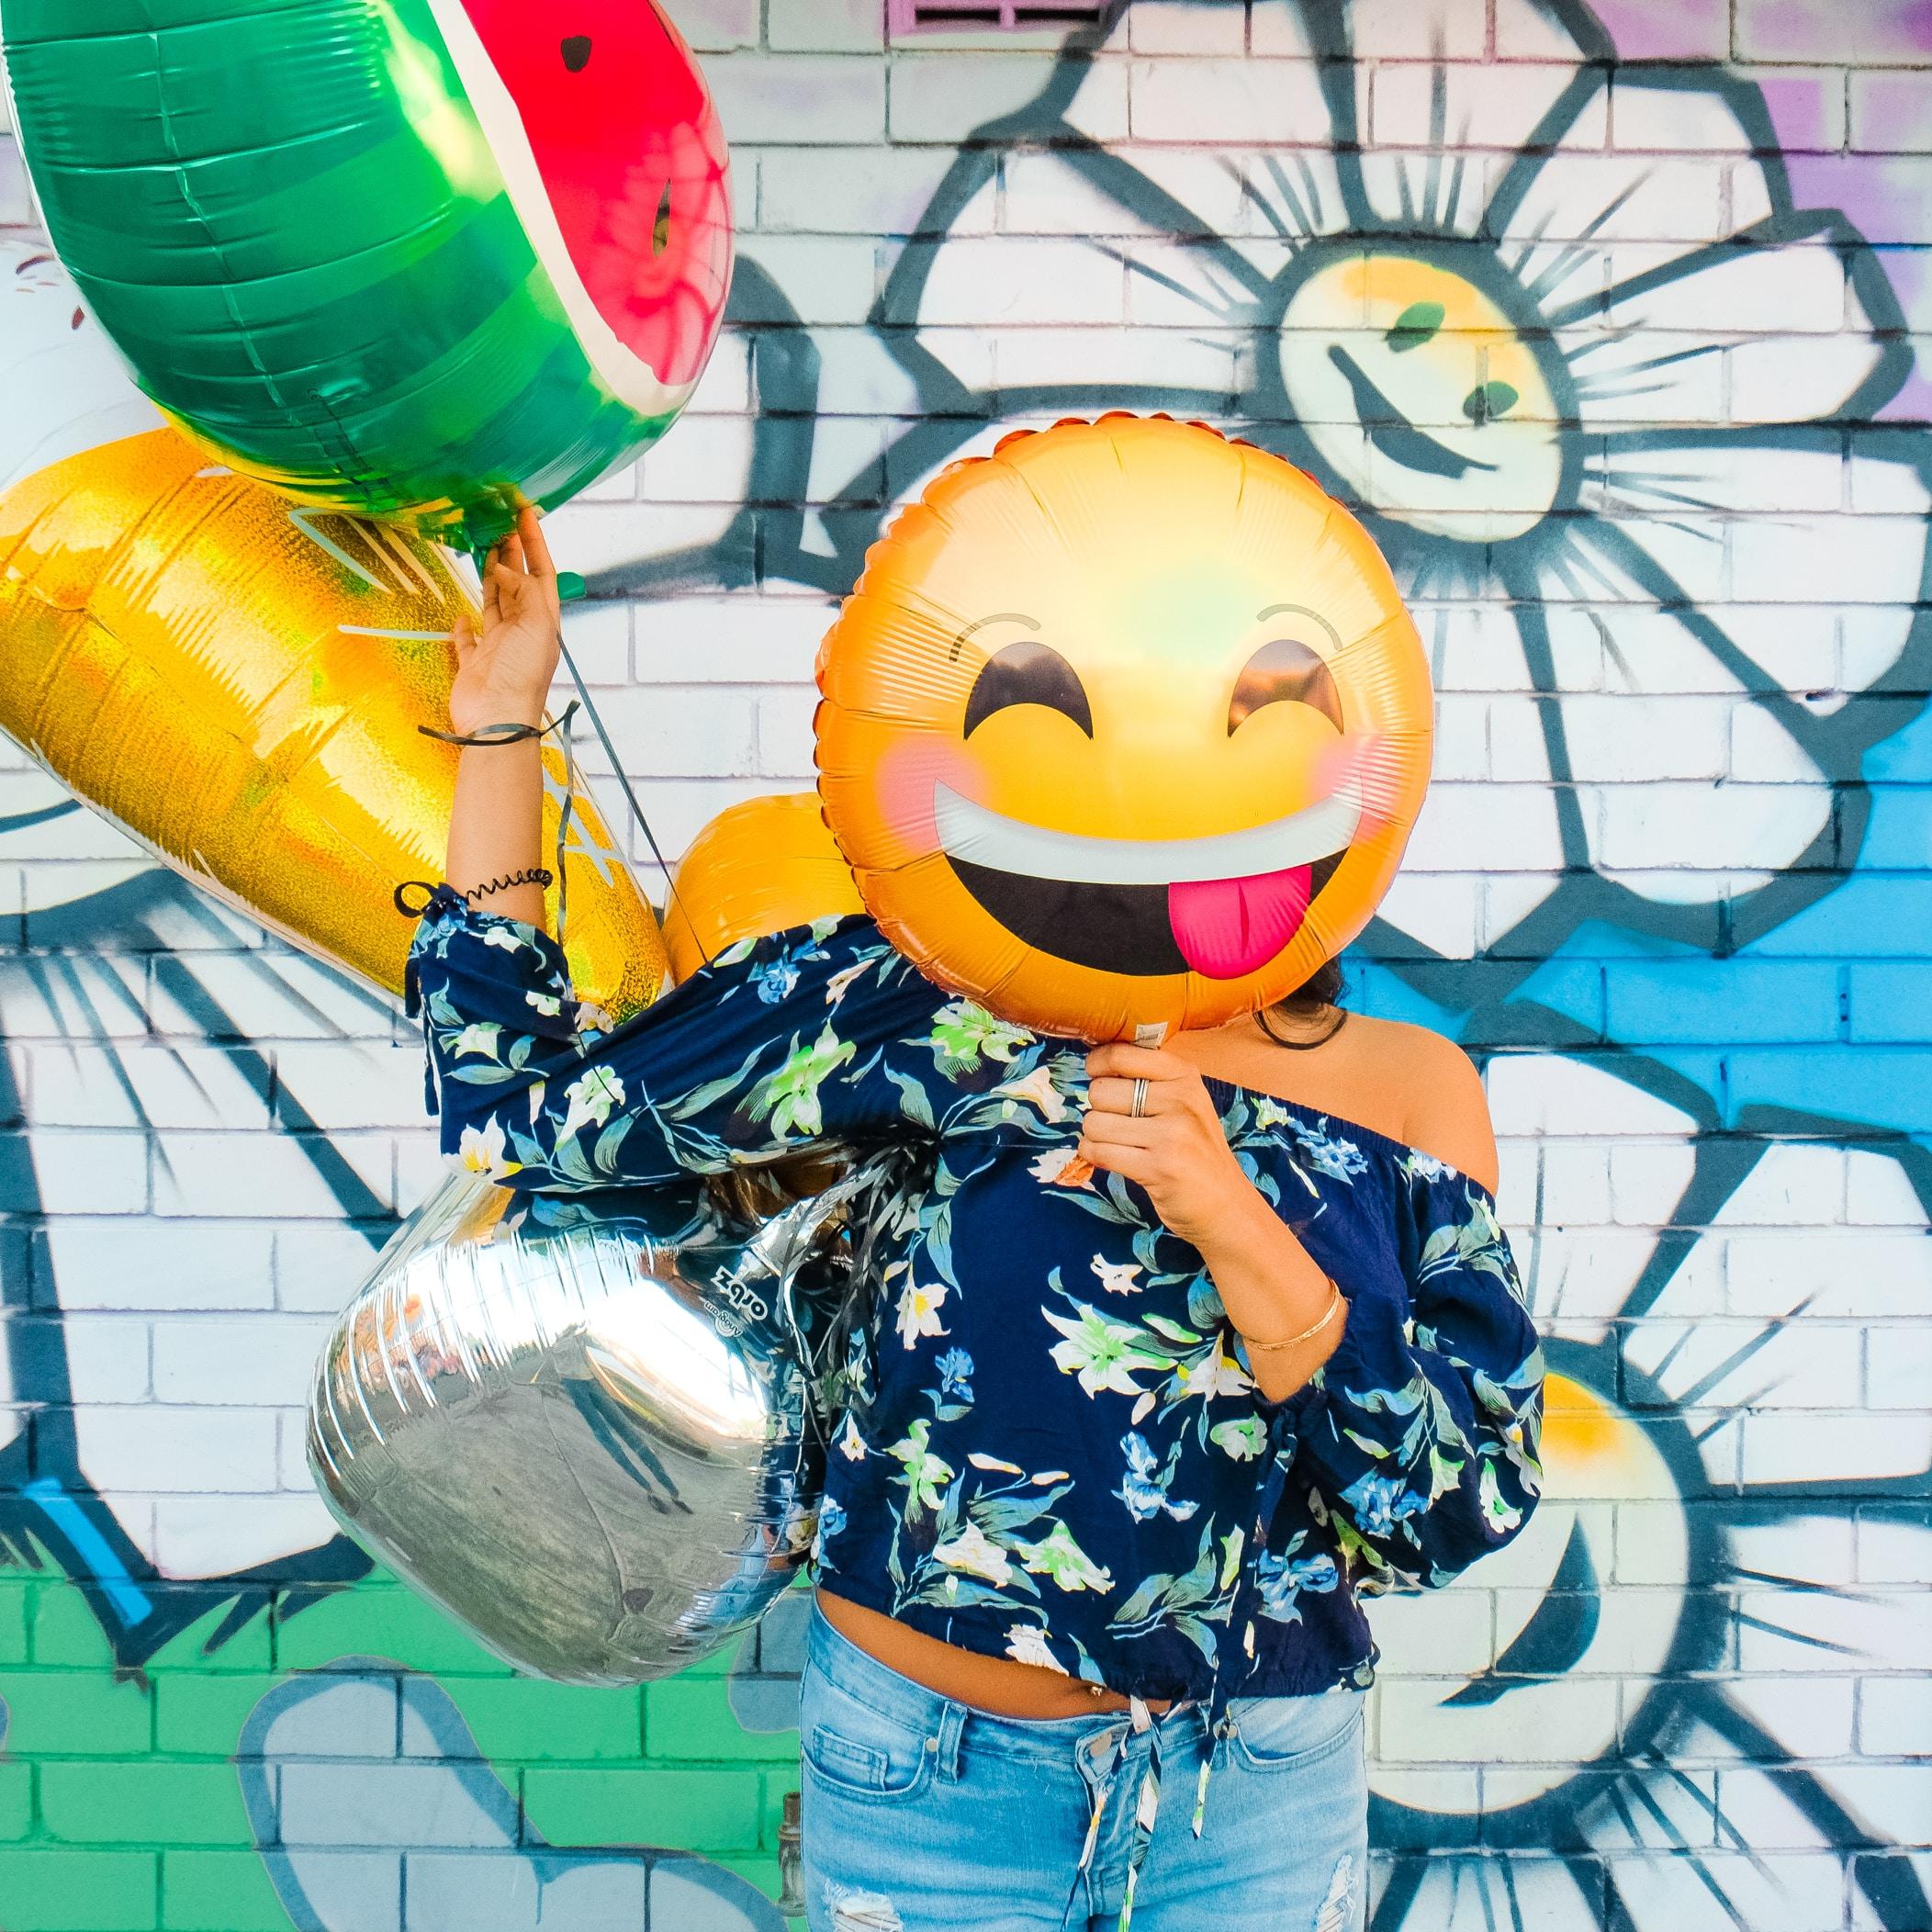 The tongue out emoji balloon